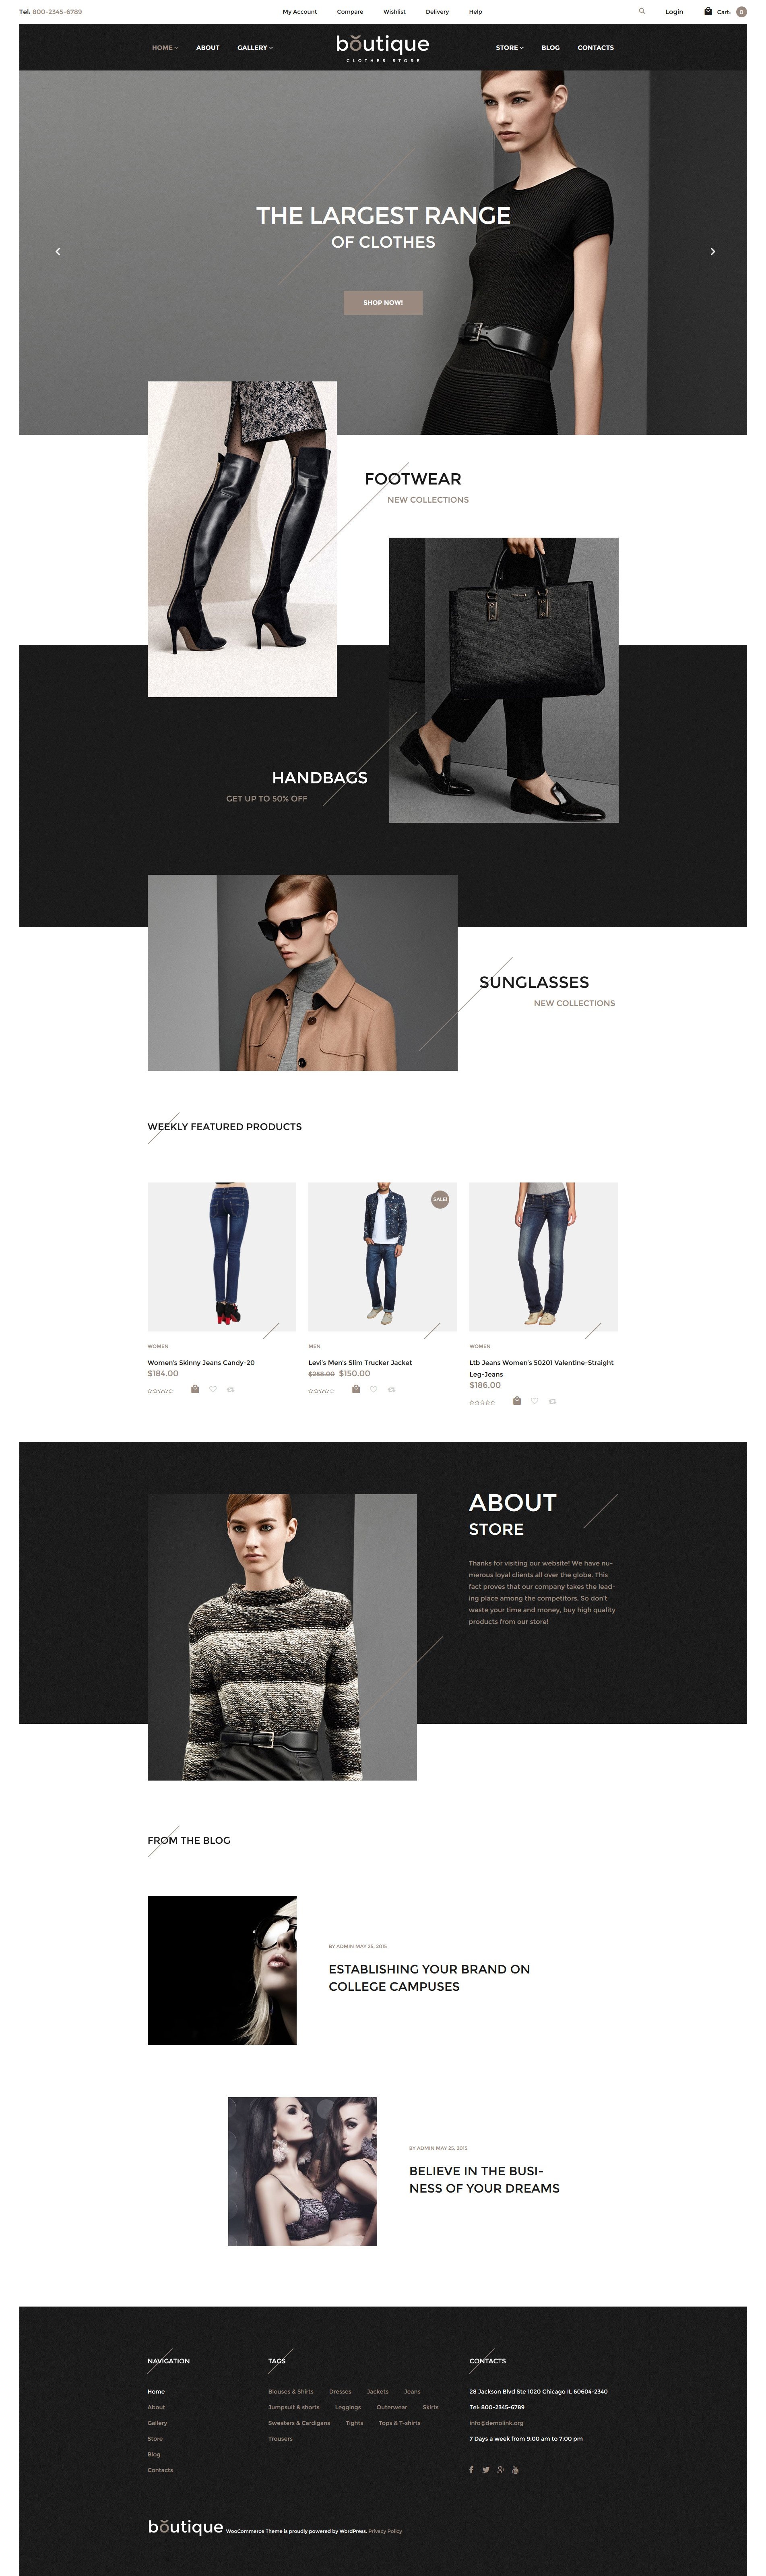 """Boutique"" - адаптивний WooCommerce шаблон №57736 - скріншот"